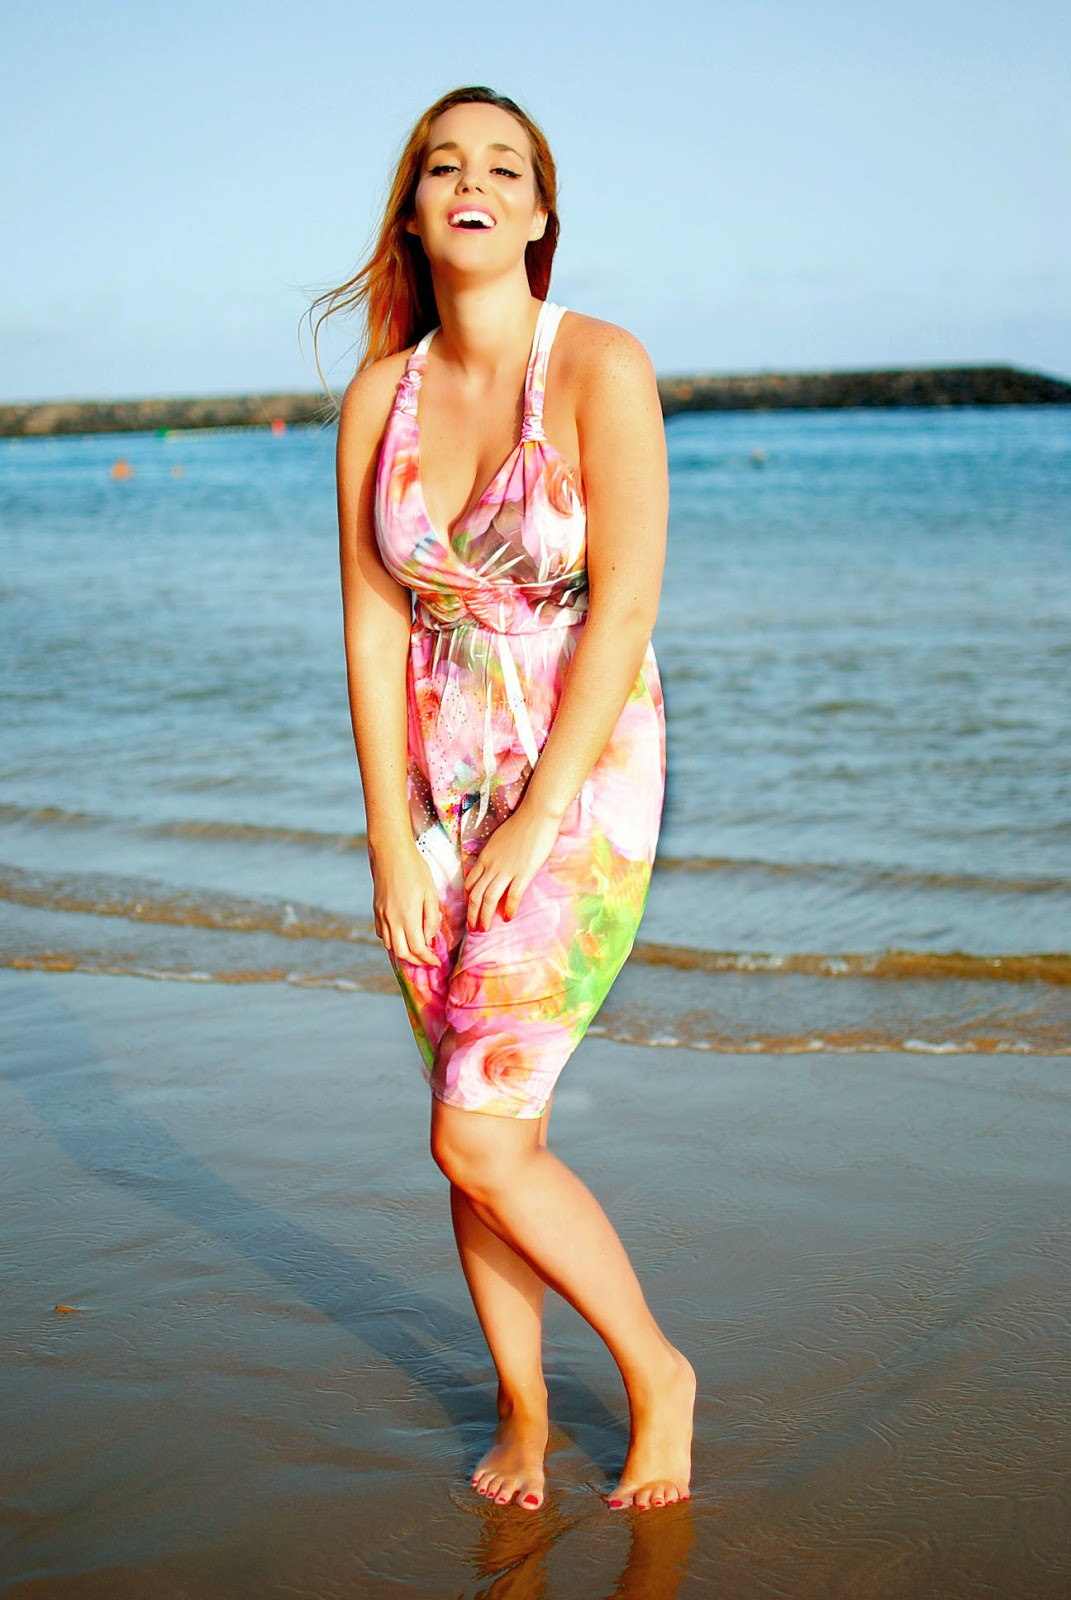 nery hdez, aftershock london, summer look, multi coloured dress,